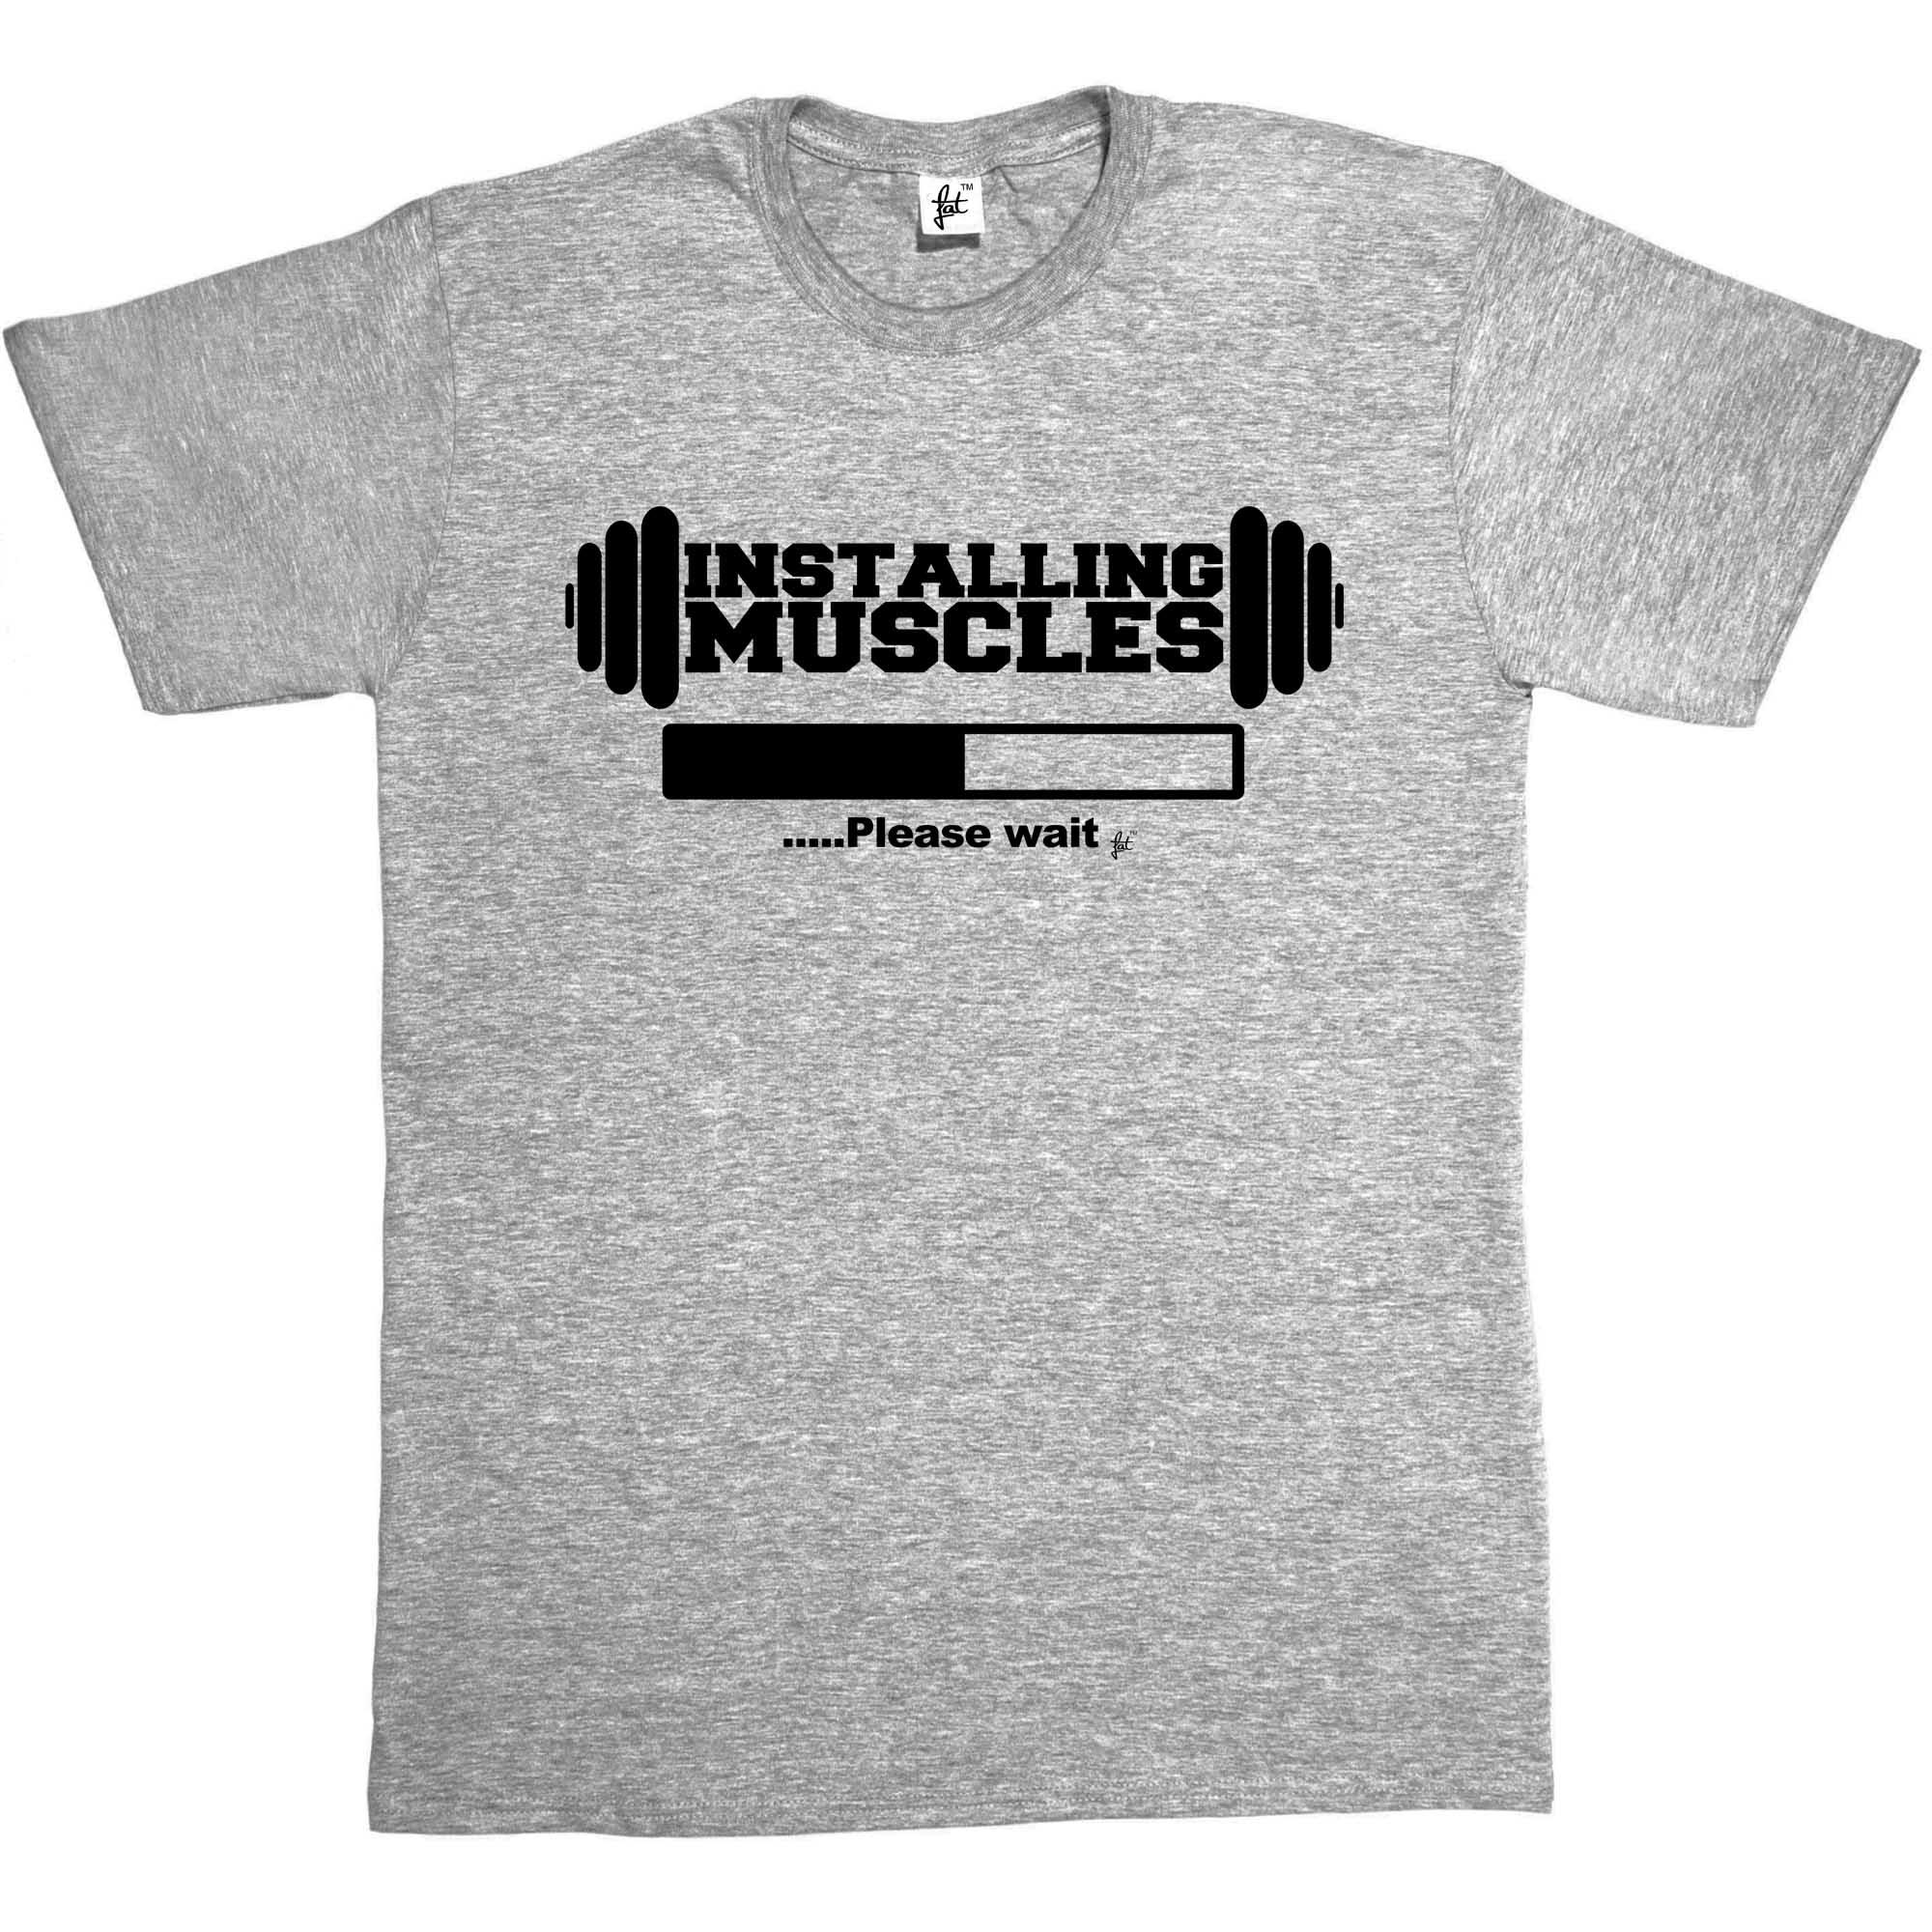 Installing Muscles Please Wait Mens T Shirt Funny Joke Slogan Fathers Day S-3XL